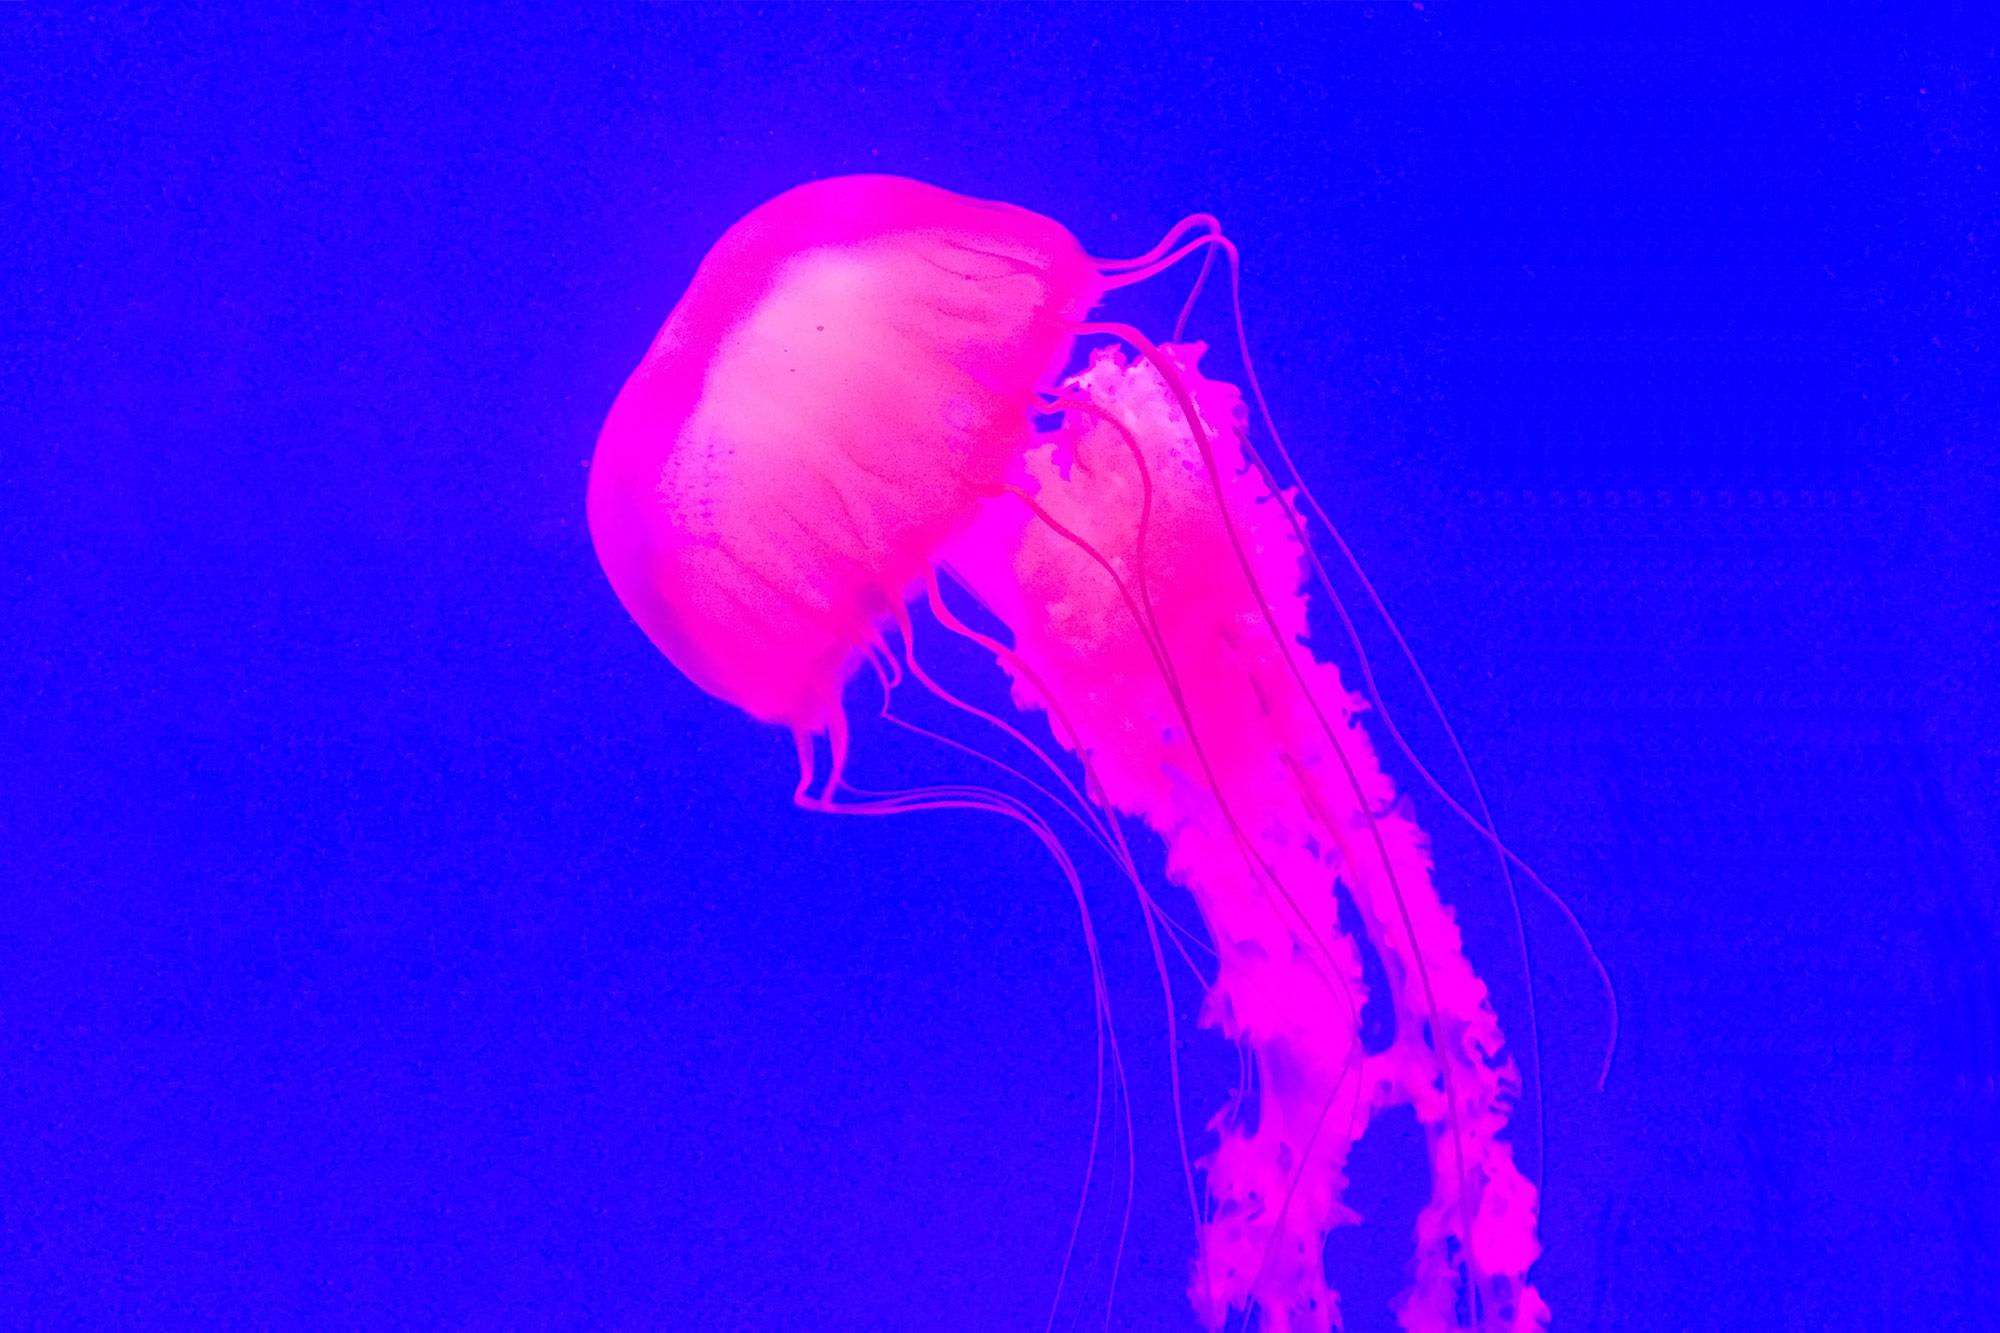 gpj-studio-visual-exploration-jelly-fish-03